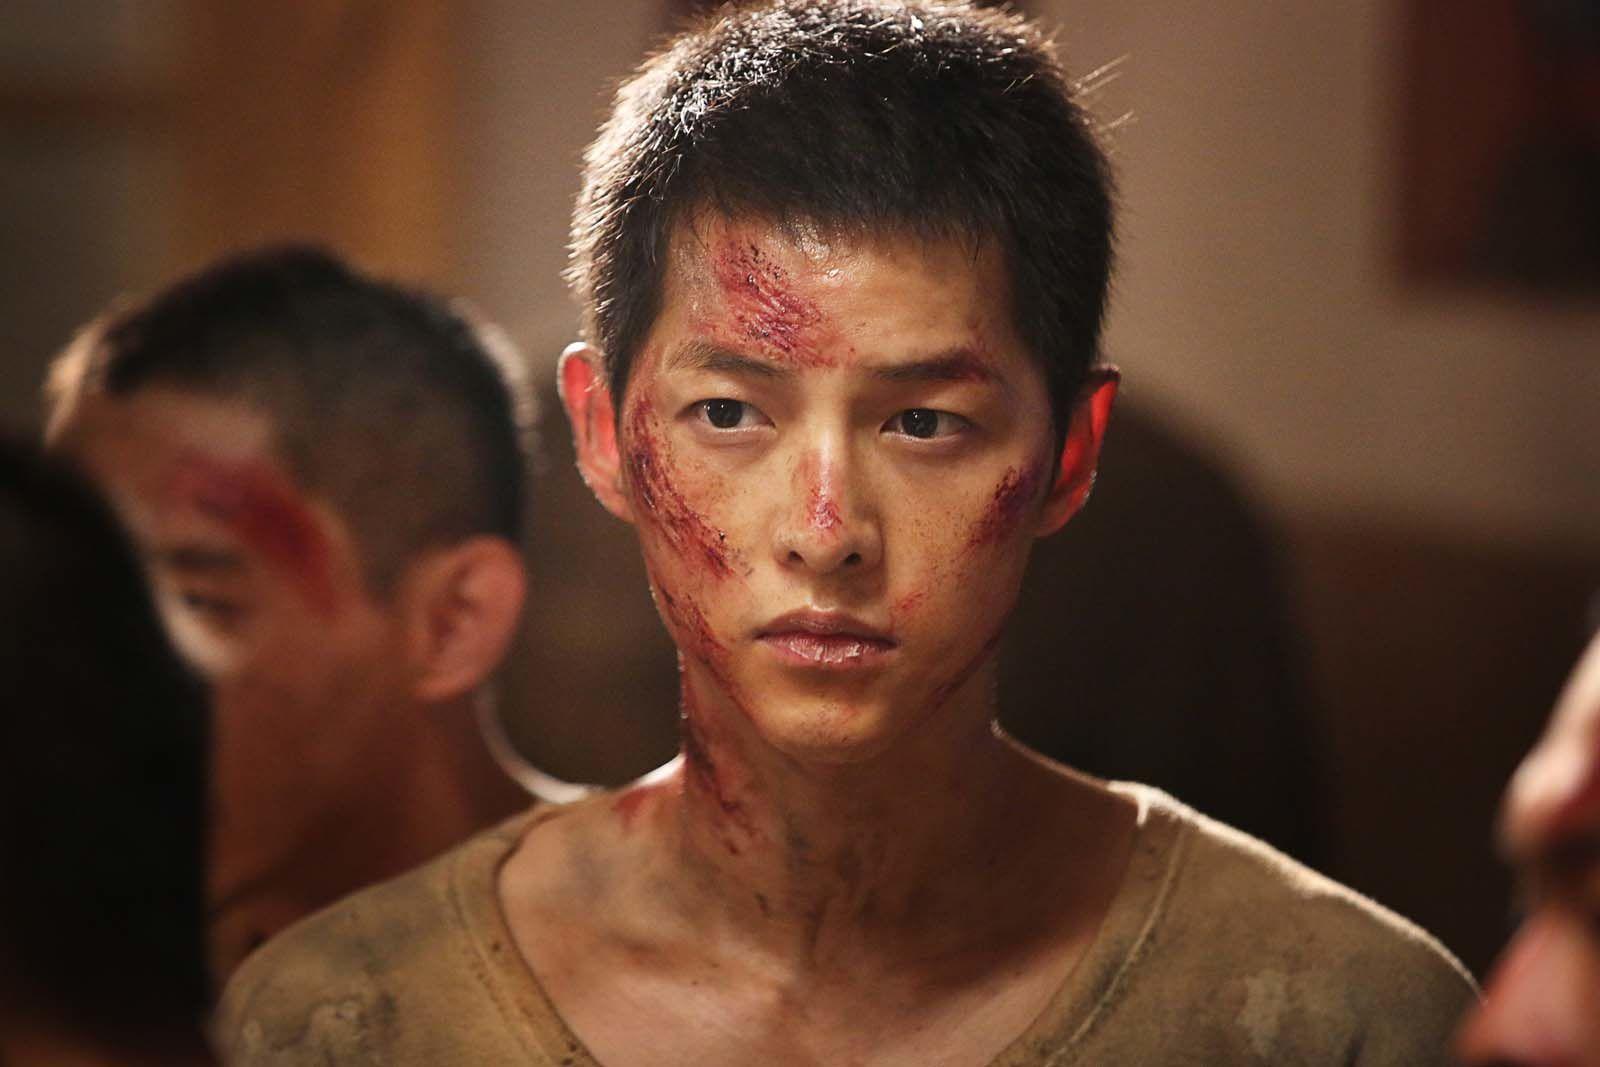 Battleship Island (BANDE-ANNONCE) de Ryoo Seung-wan - Le 14 mars 2018 au cinéma